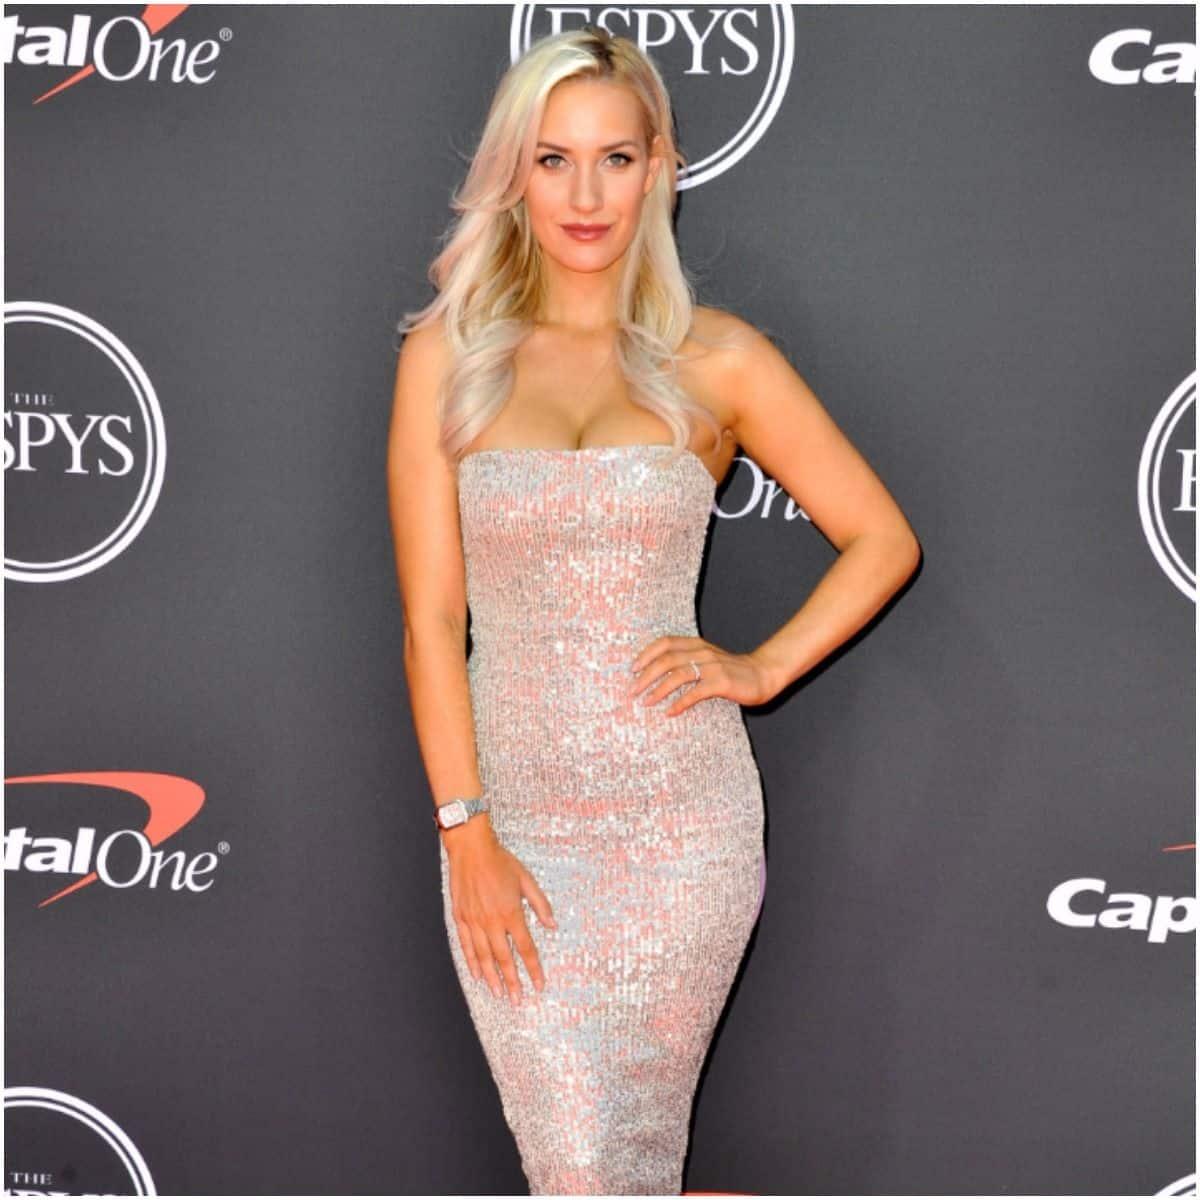 Paige Spiranac age